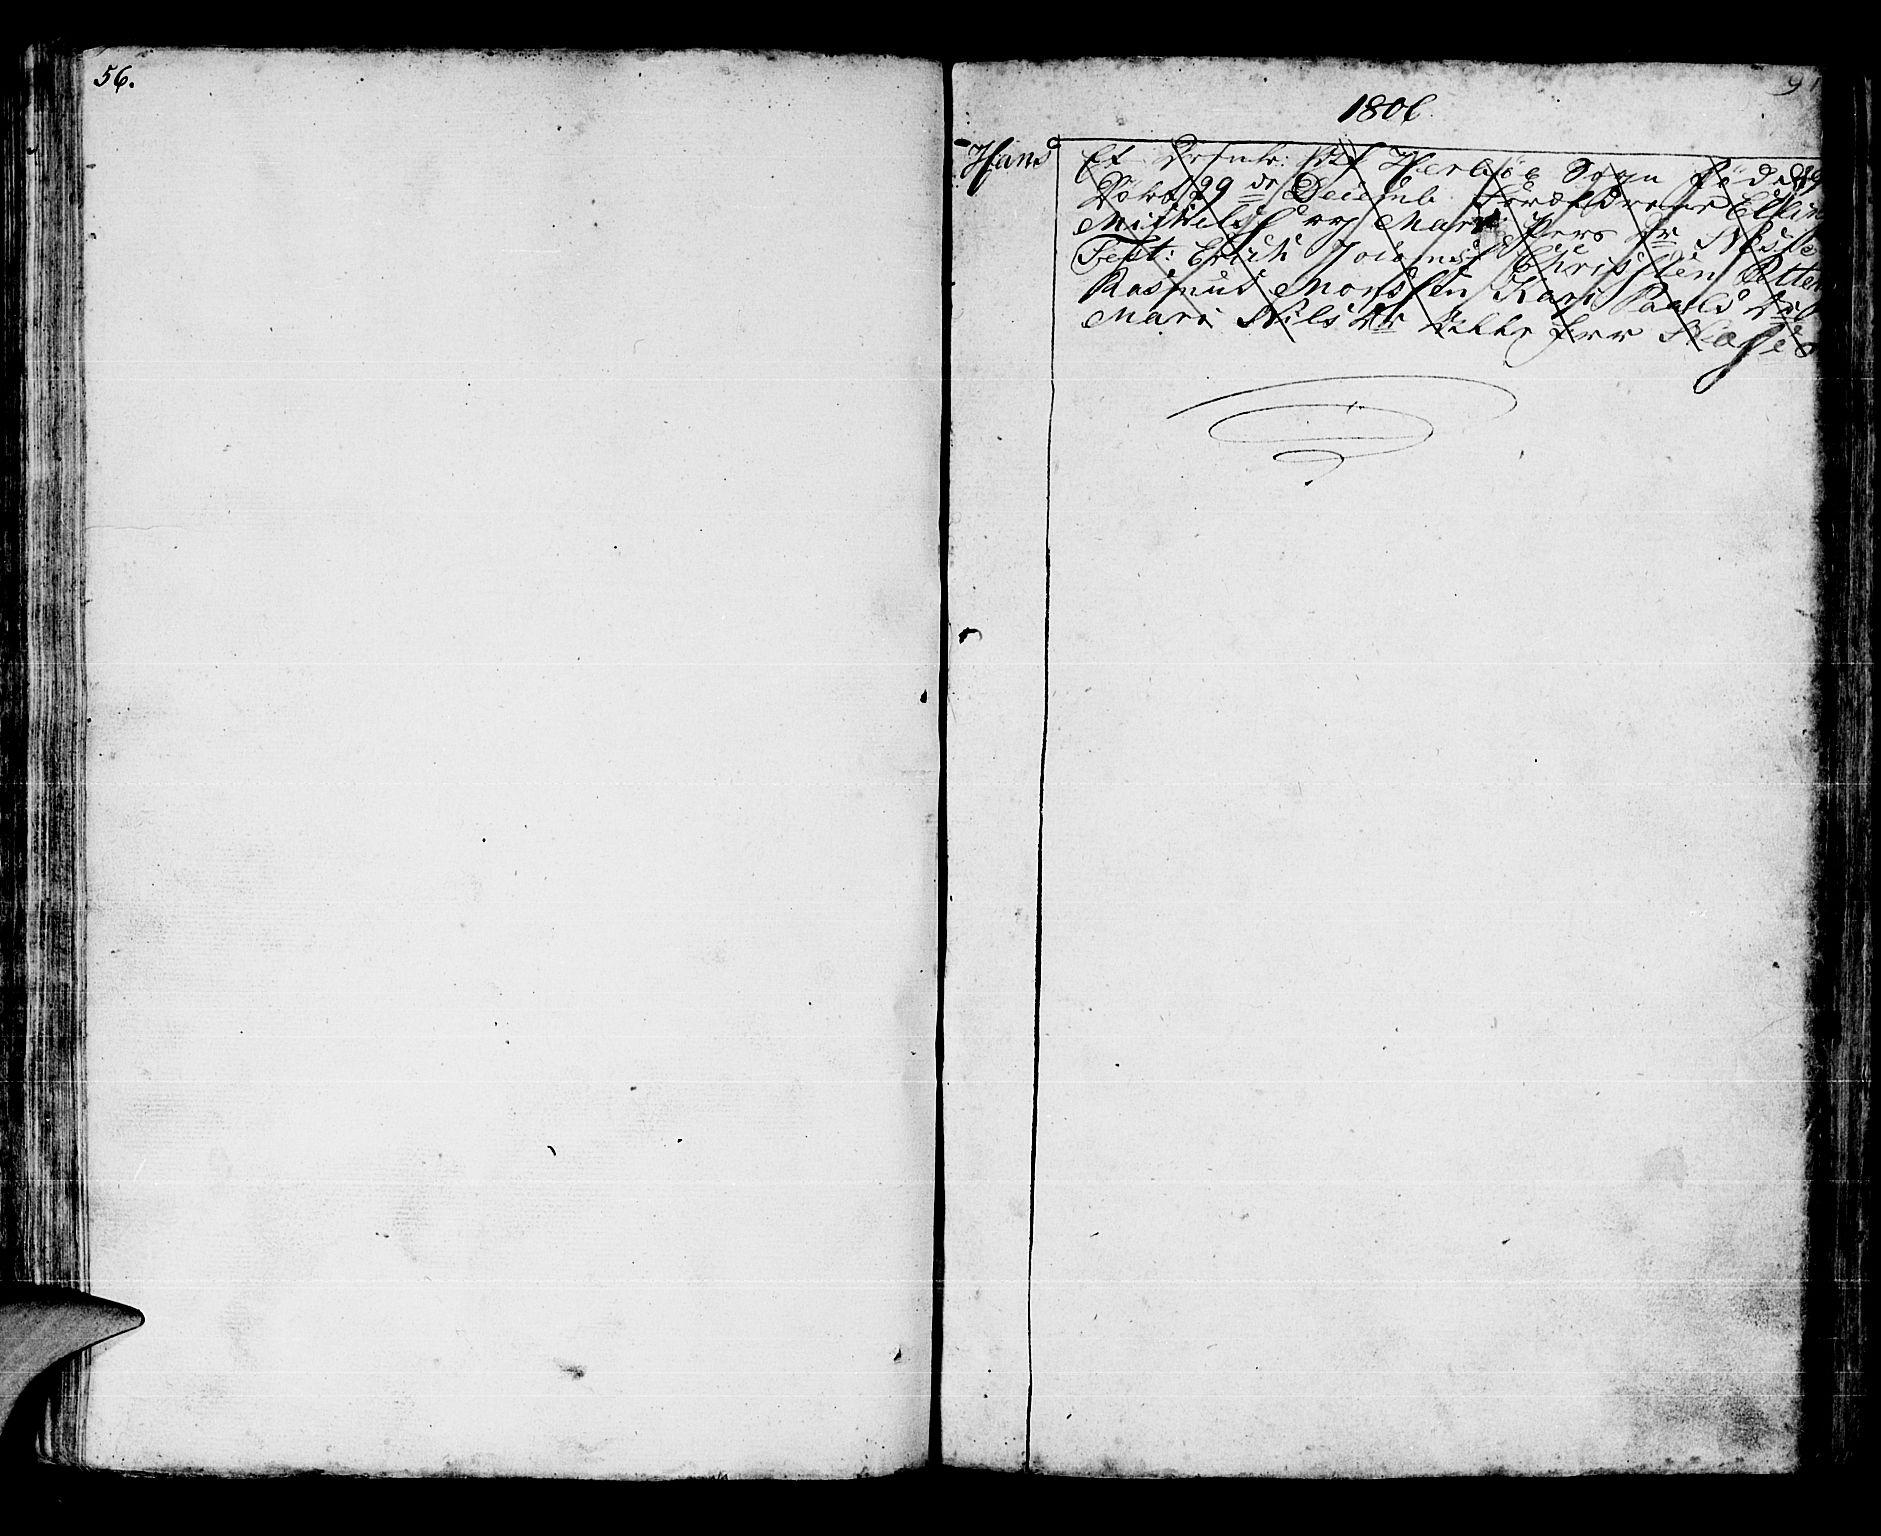 SAB, Manger sokneprestembete, H/Haa: Parish register (official) no. A 2, 1792-1815, p. 152